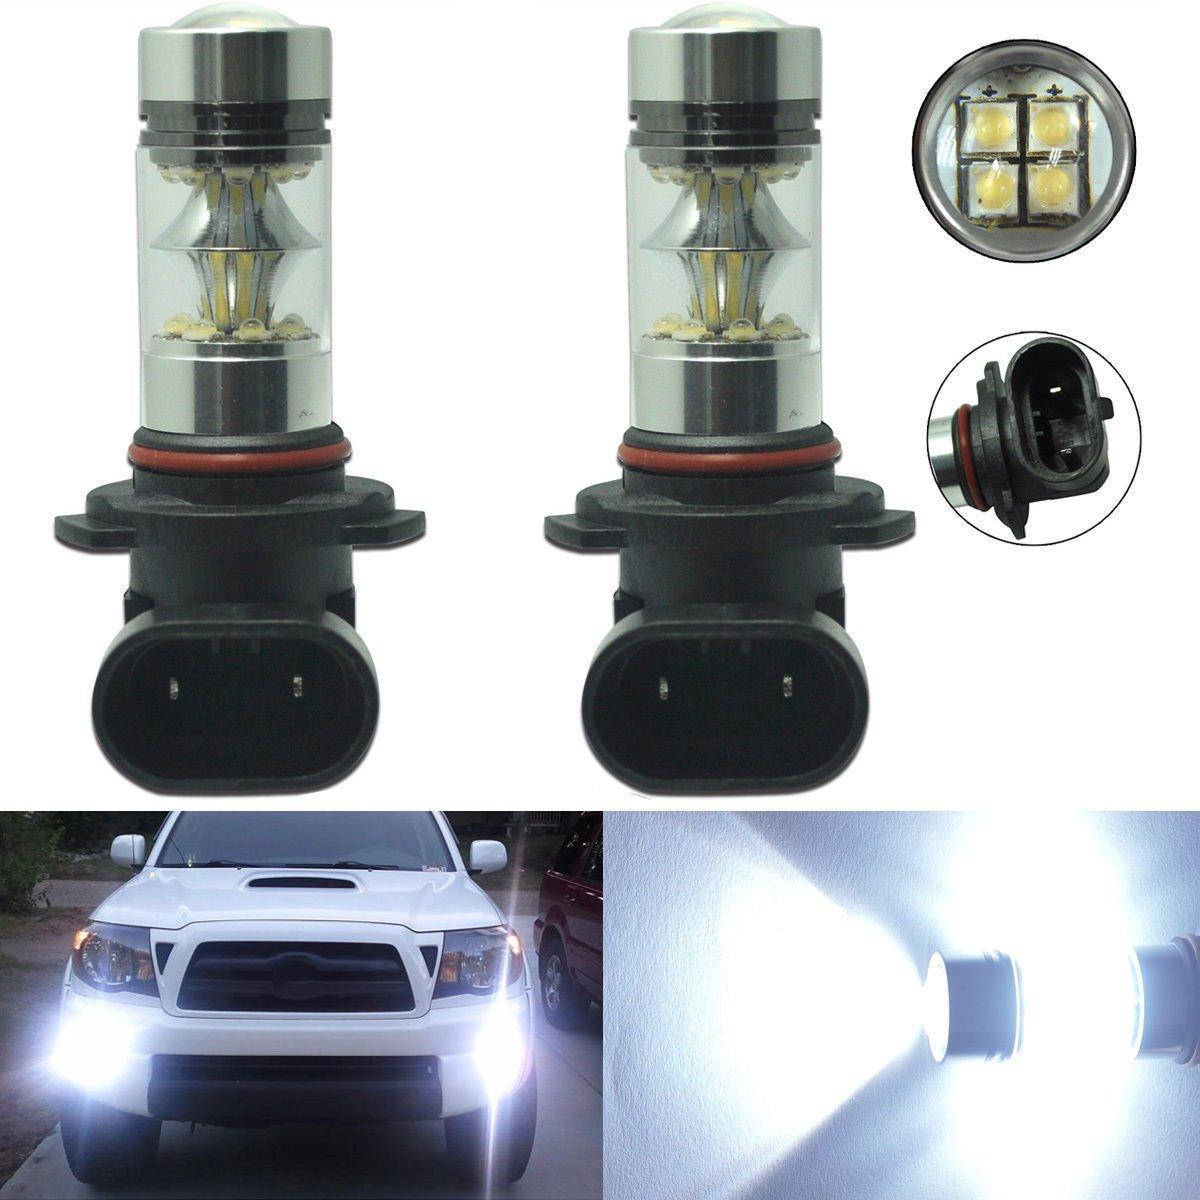 2 x 100W H10 9145 High Power CREE LED 6000K Super White Fog Light Lamp Bulbs Carb Omar